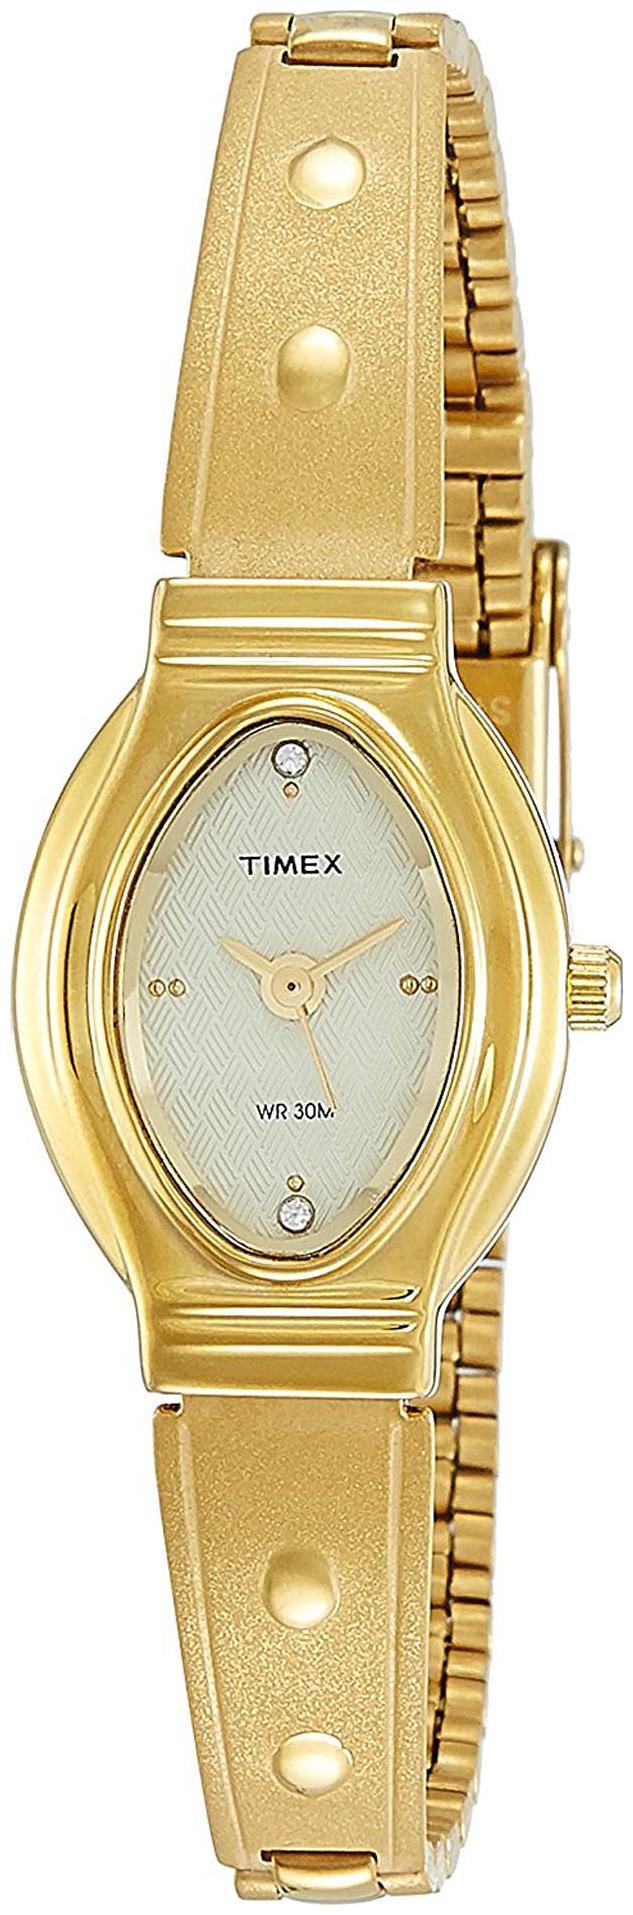 Timex JW12 Women Analog Watches by Jabraat Com